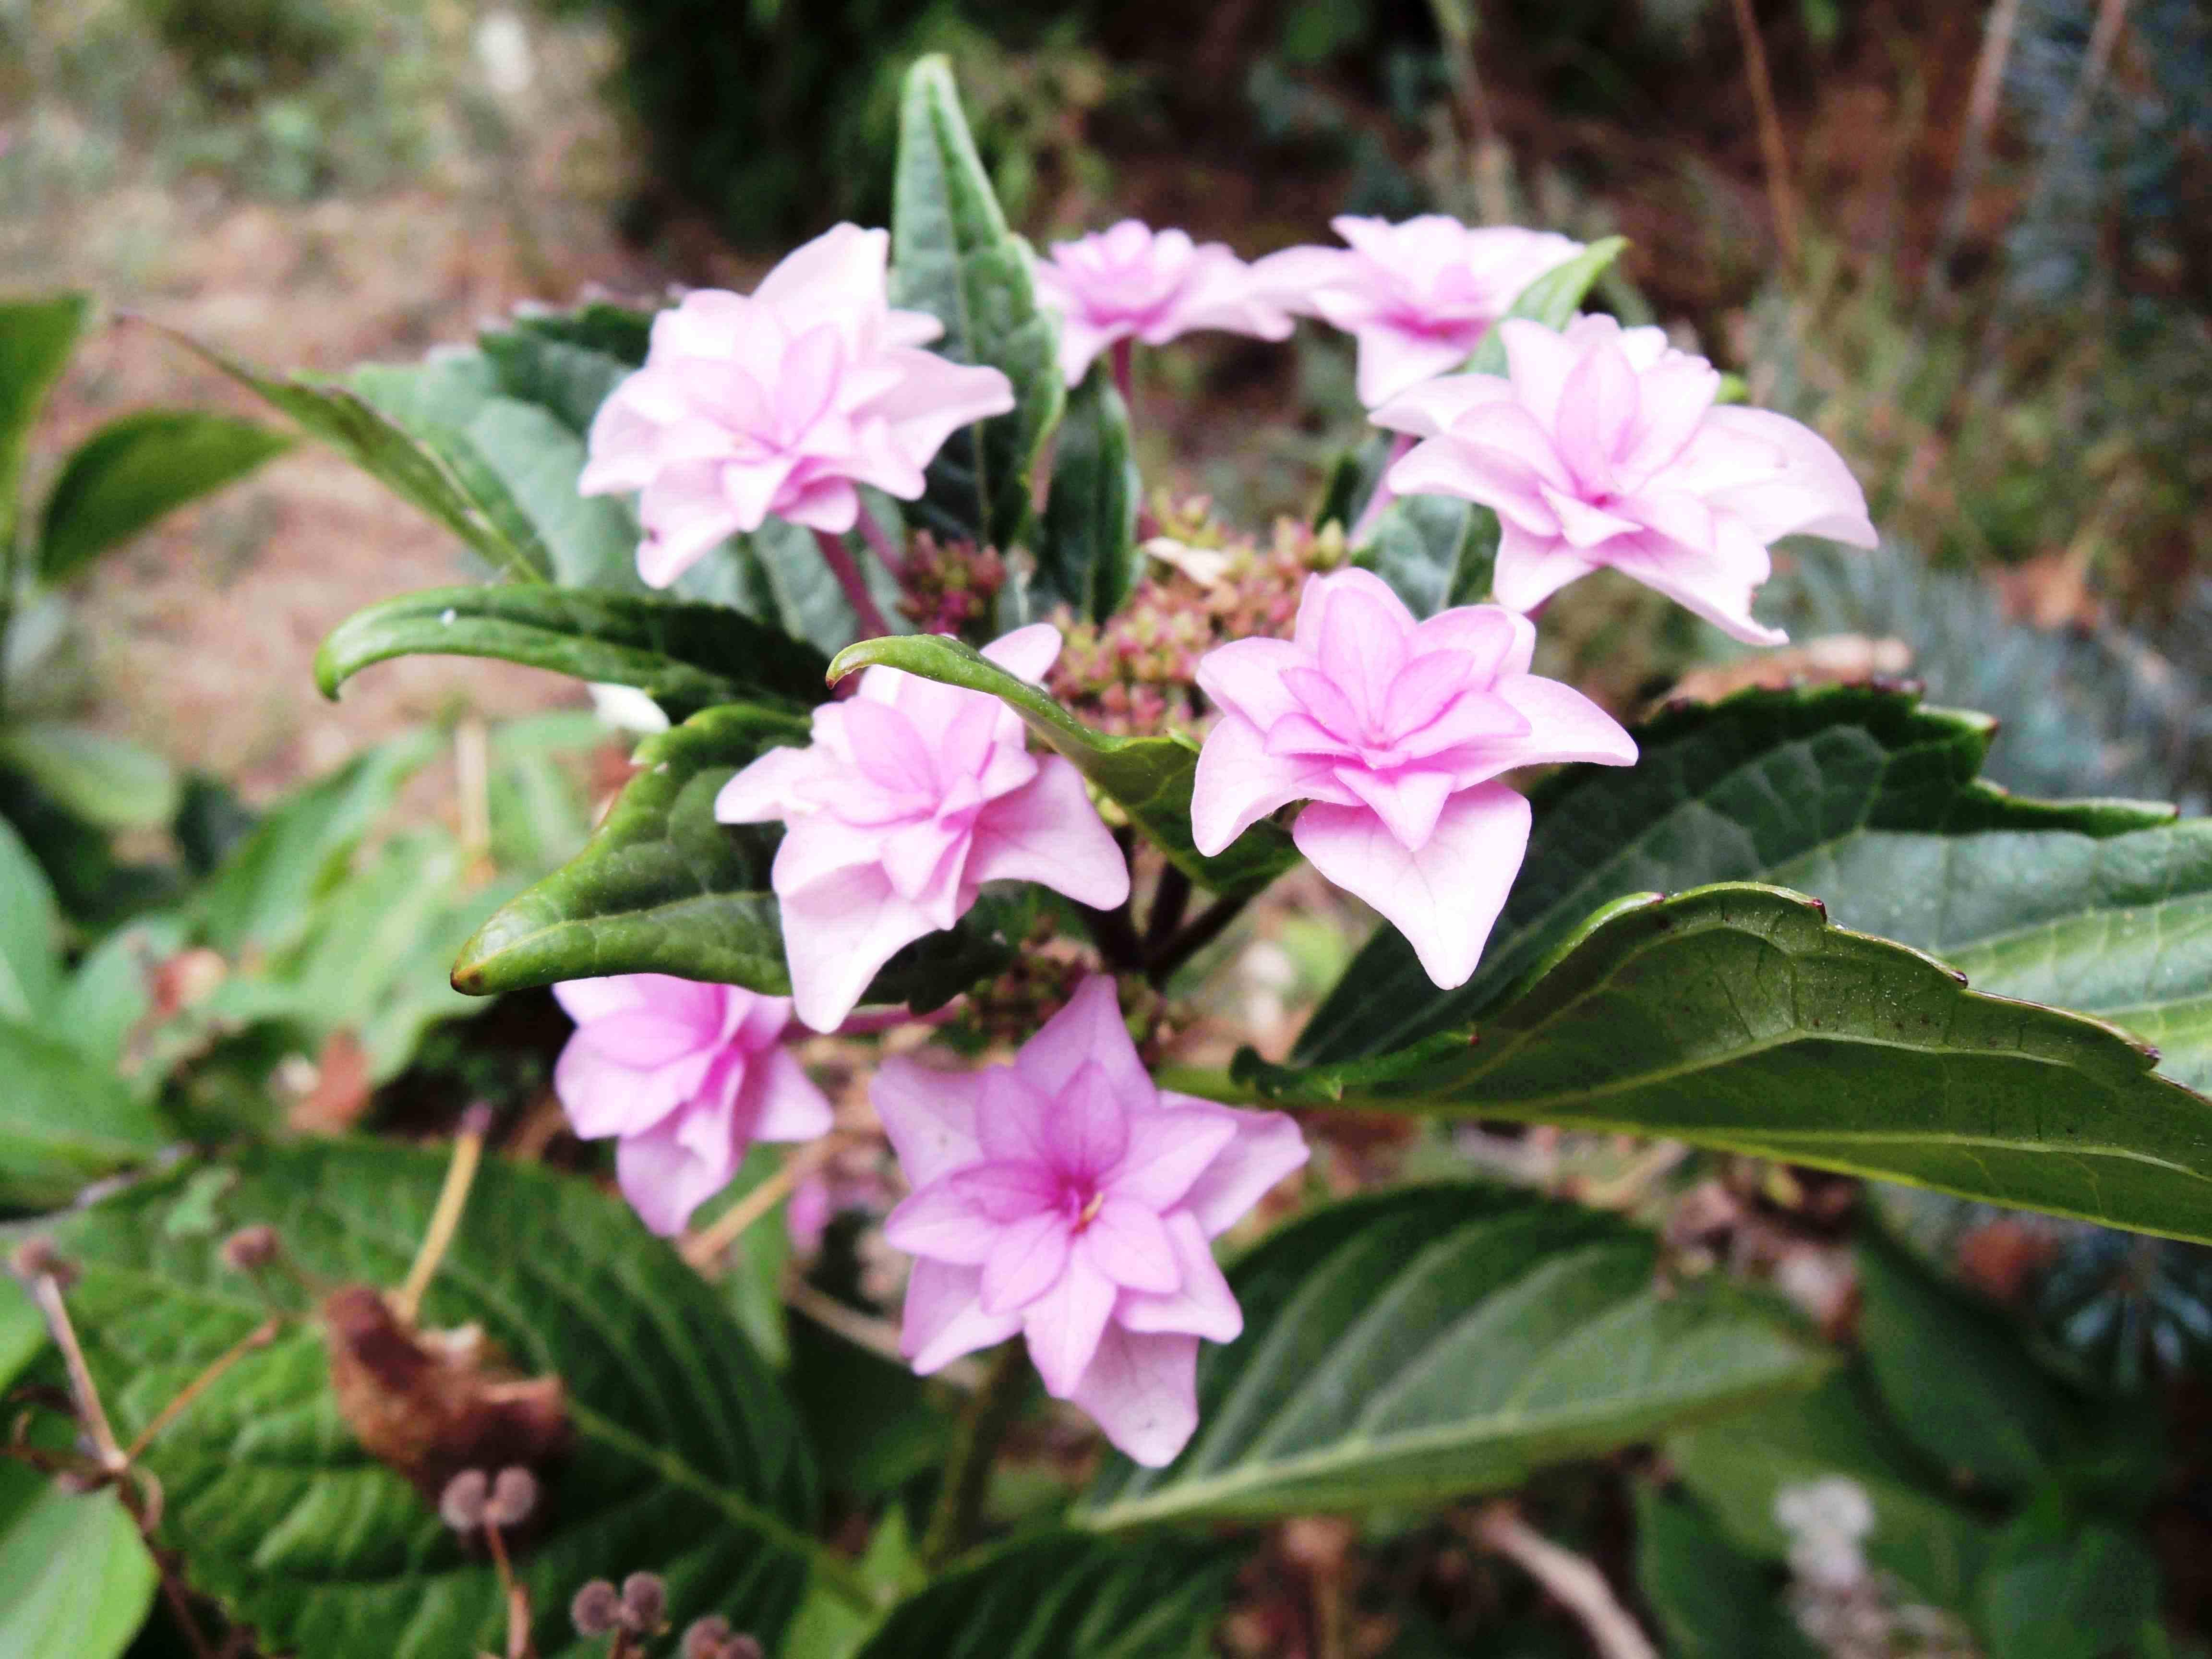 Hydrangea Macrophylla 'romance'® 'you And Me'